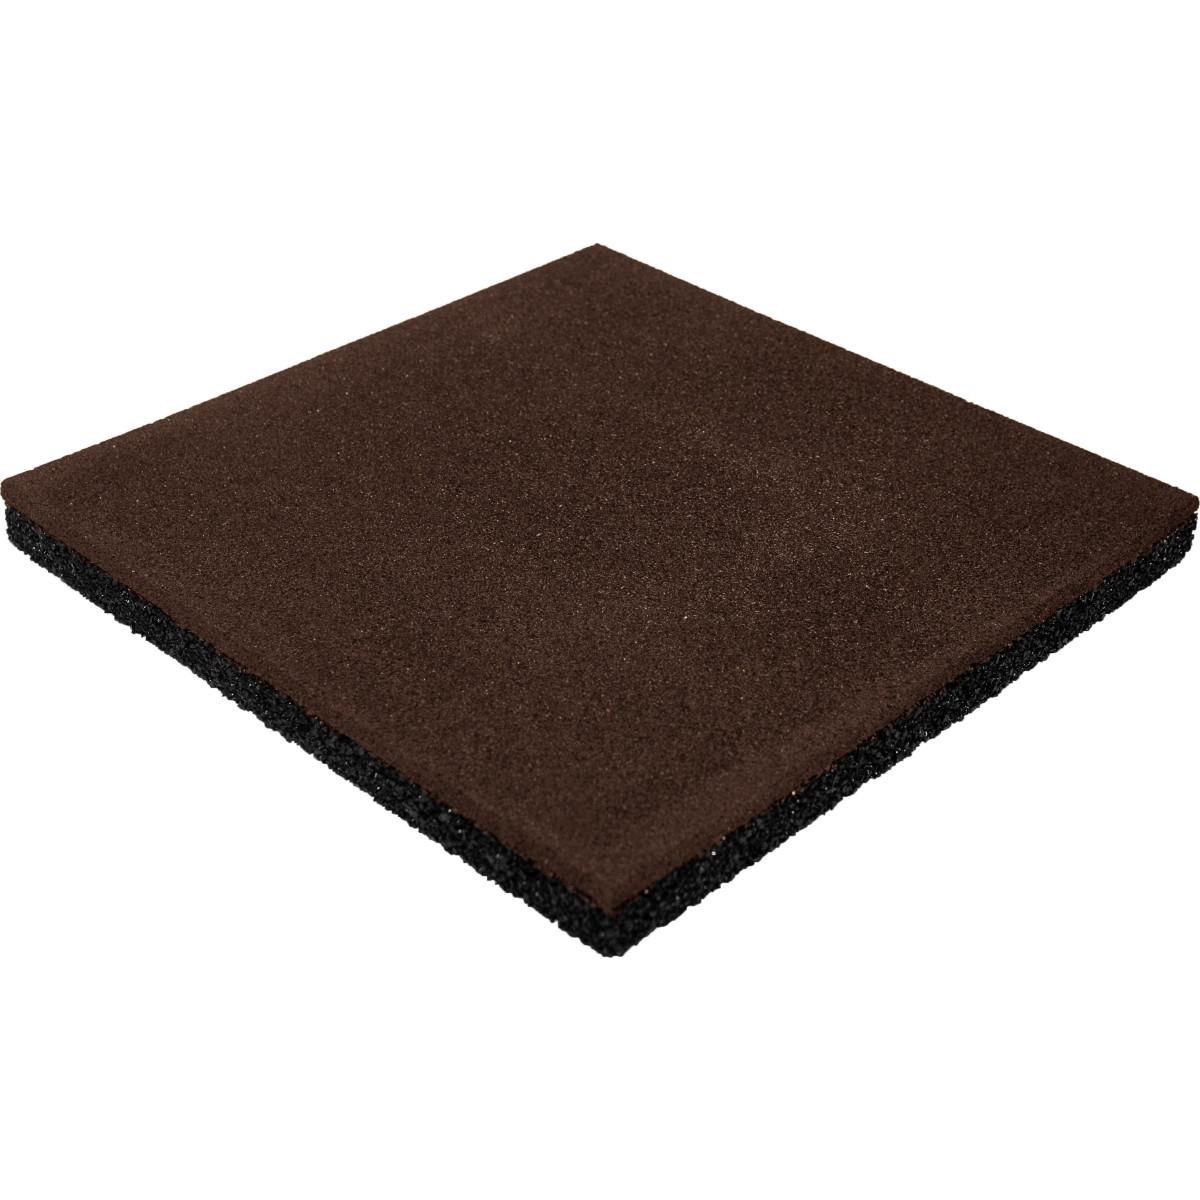 Плитка резиновая 500х500х40 пуансон коричневый